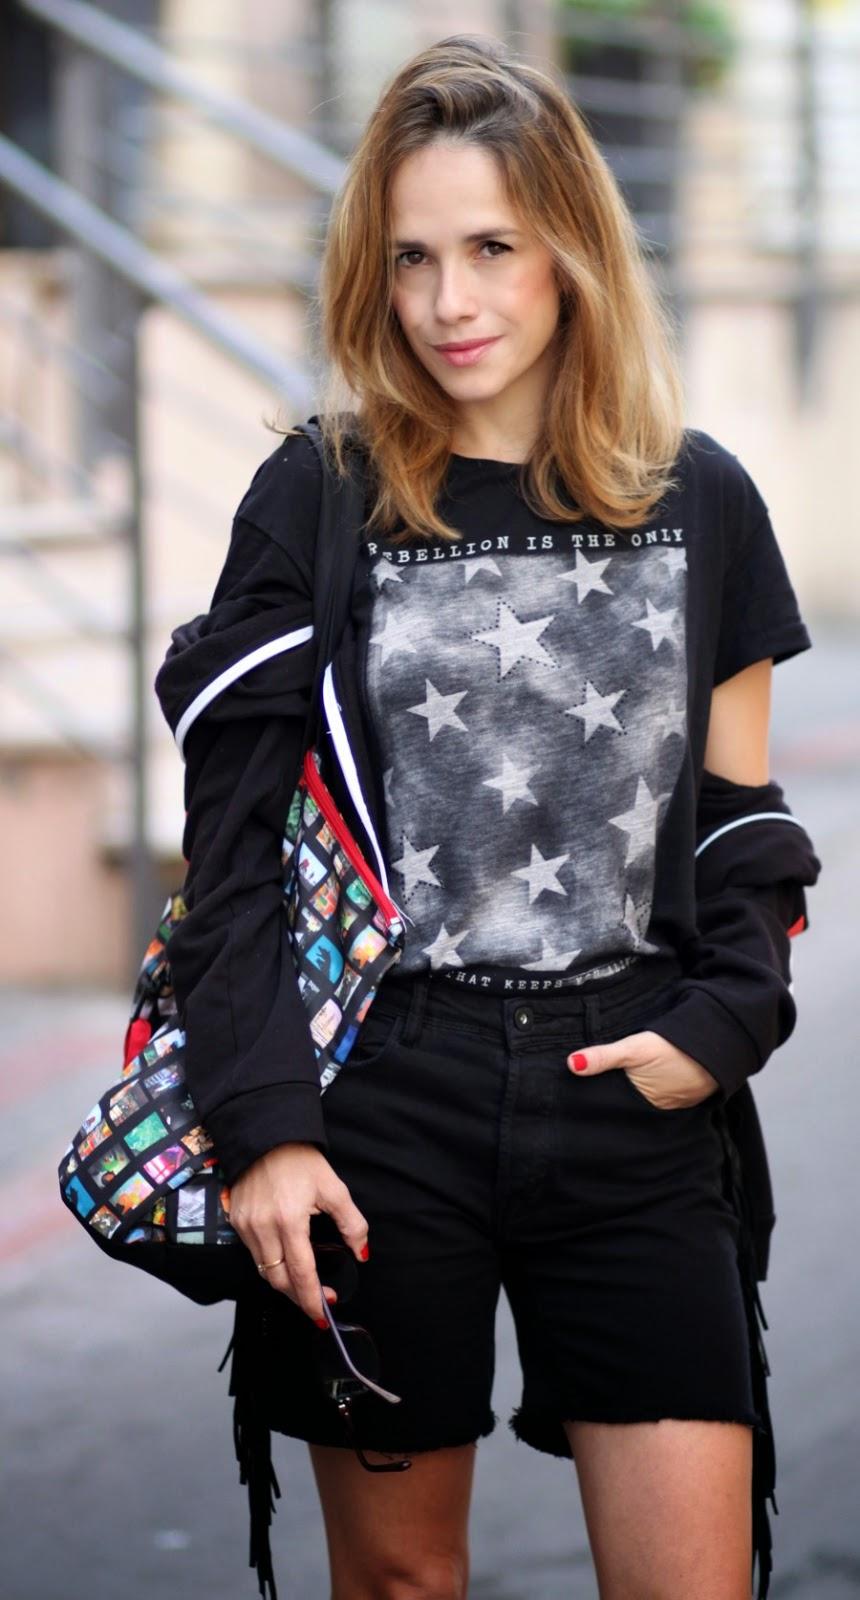 totalblack, eachxother, shorts, streetstyle, ss15, starsprint, fashionblog, blog, אופנה, בלוגאופנה, סטייל, בלוגריתאופנה, טלינחשון,